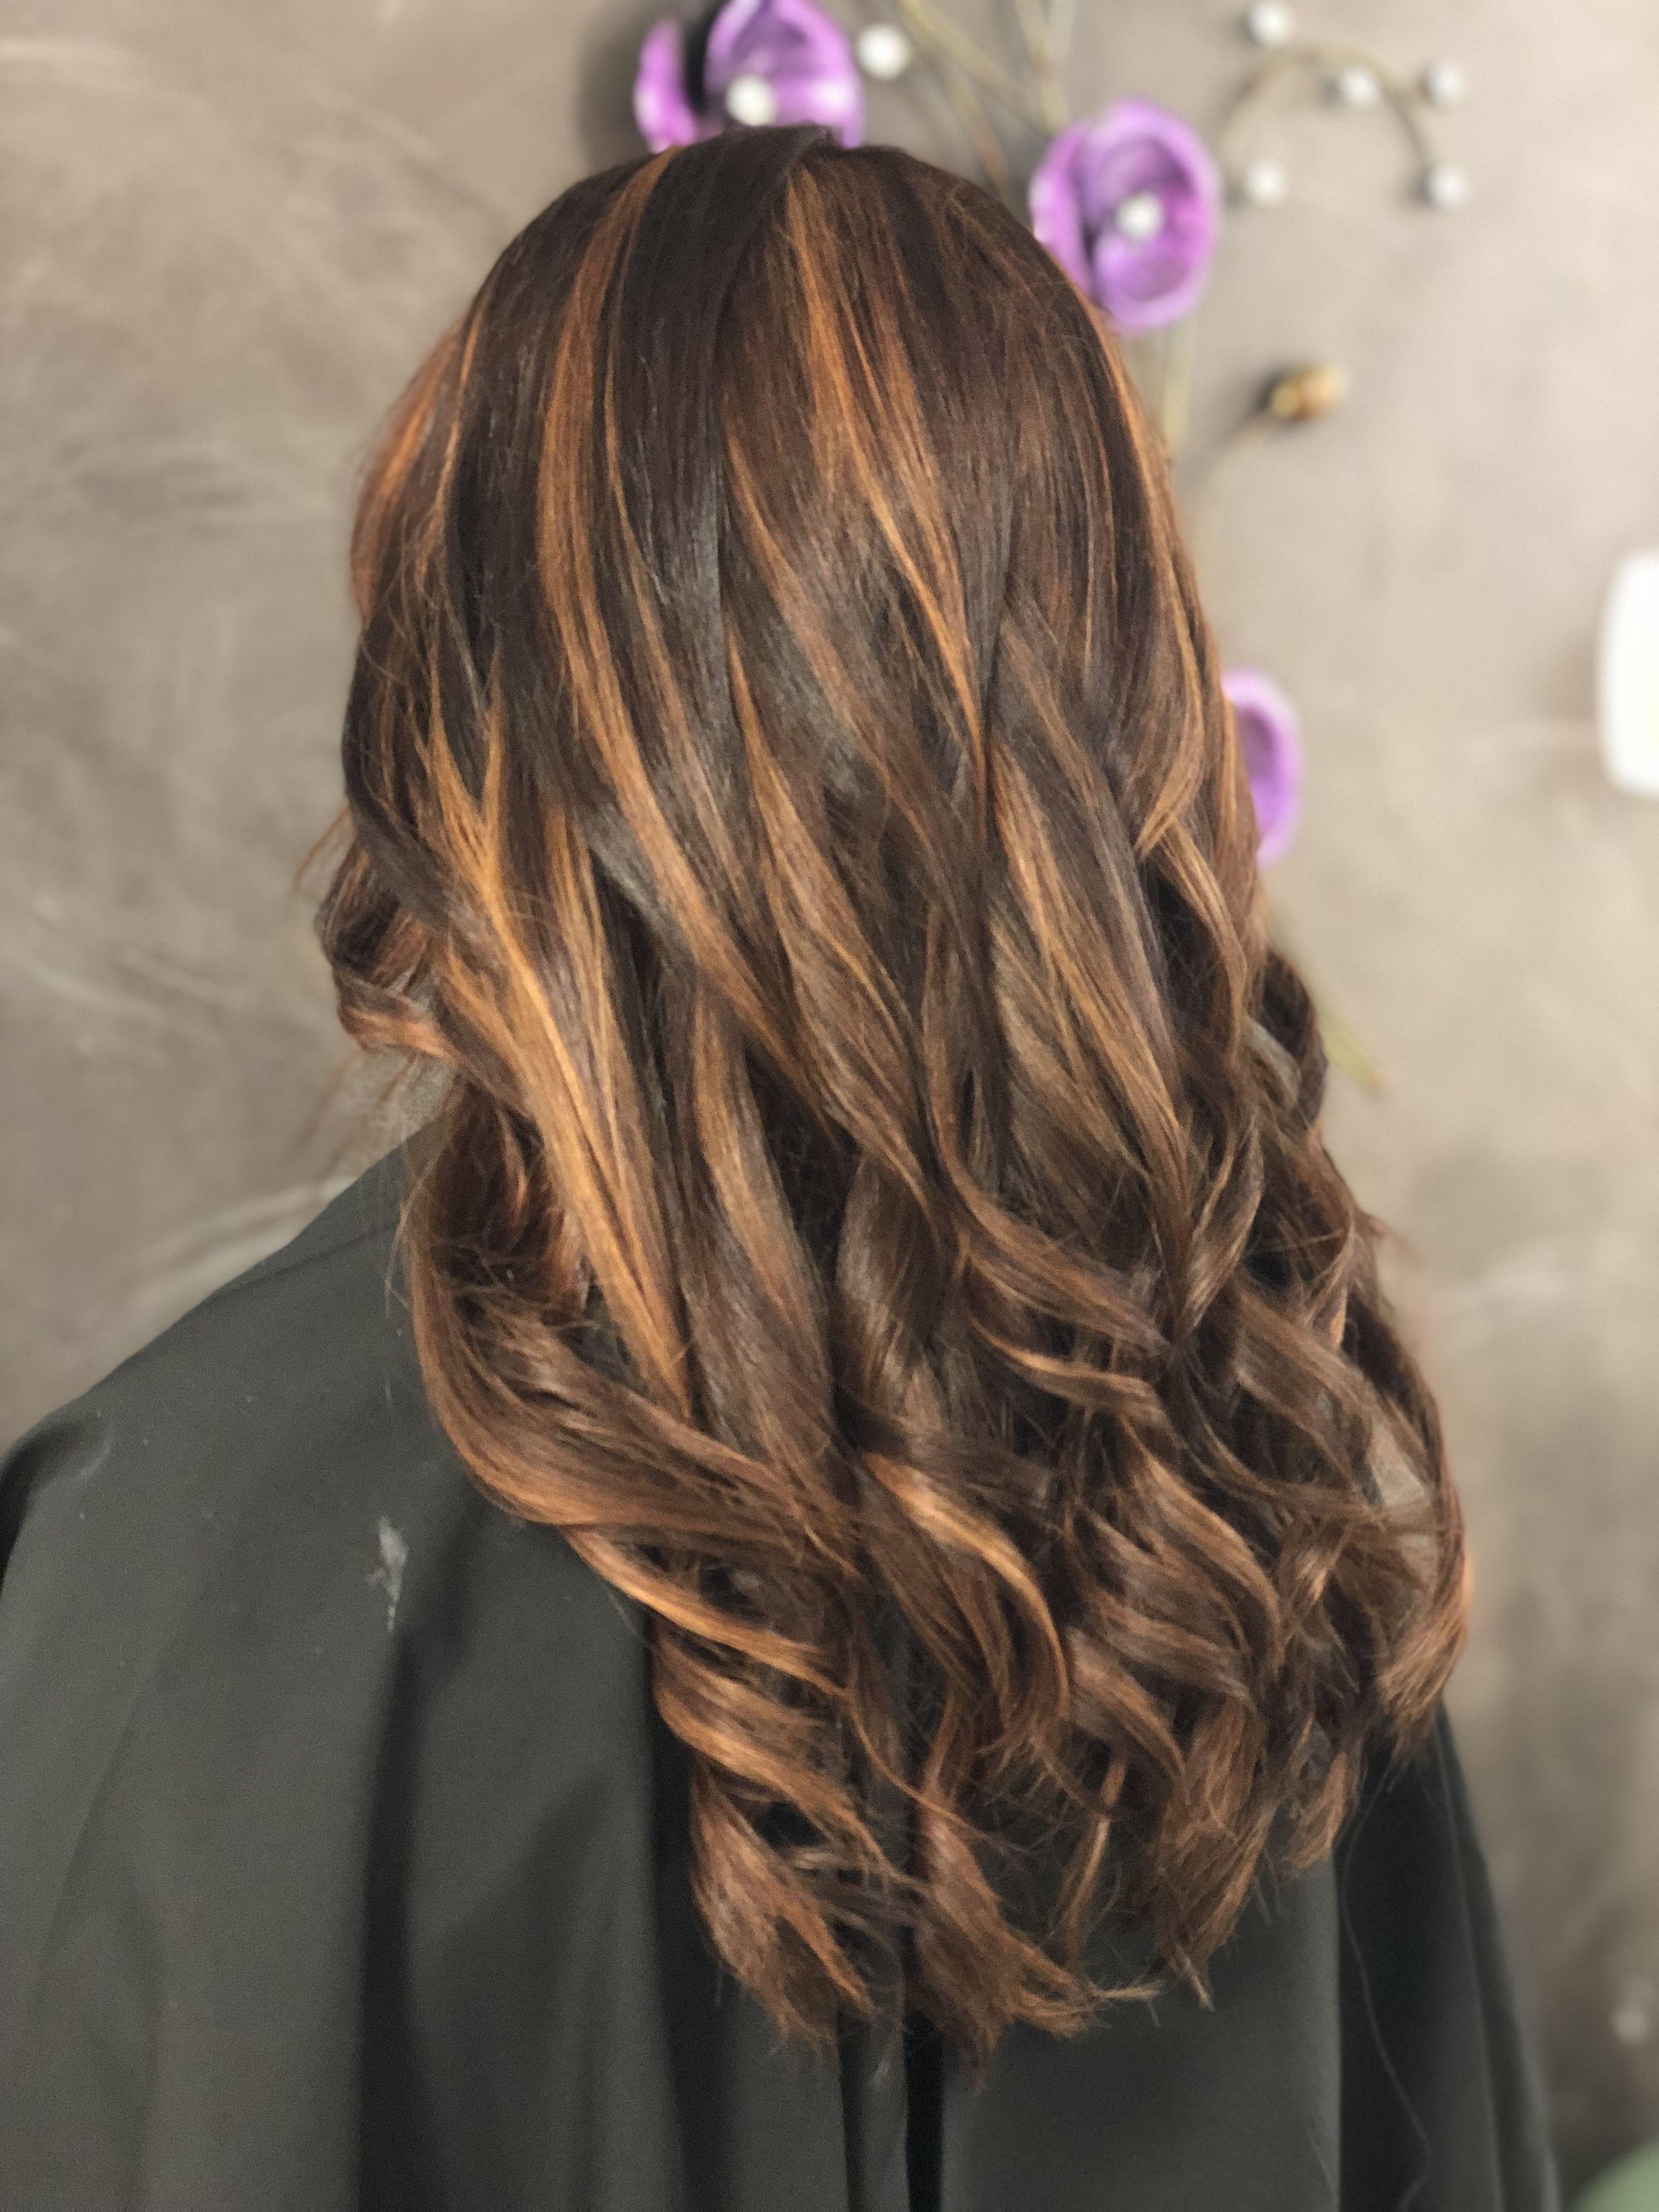 All Nutrient 5ch 25 Vol 6rc 25 Vol Bleach 20 Vol And Toned Highlights With 7rc Teasedhair Teasedtoo Teasedhairand Teased Hair Hair Skin Hair Color